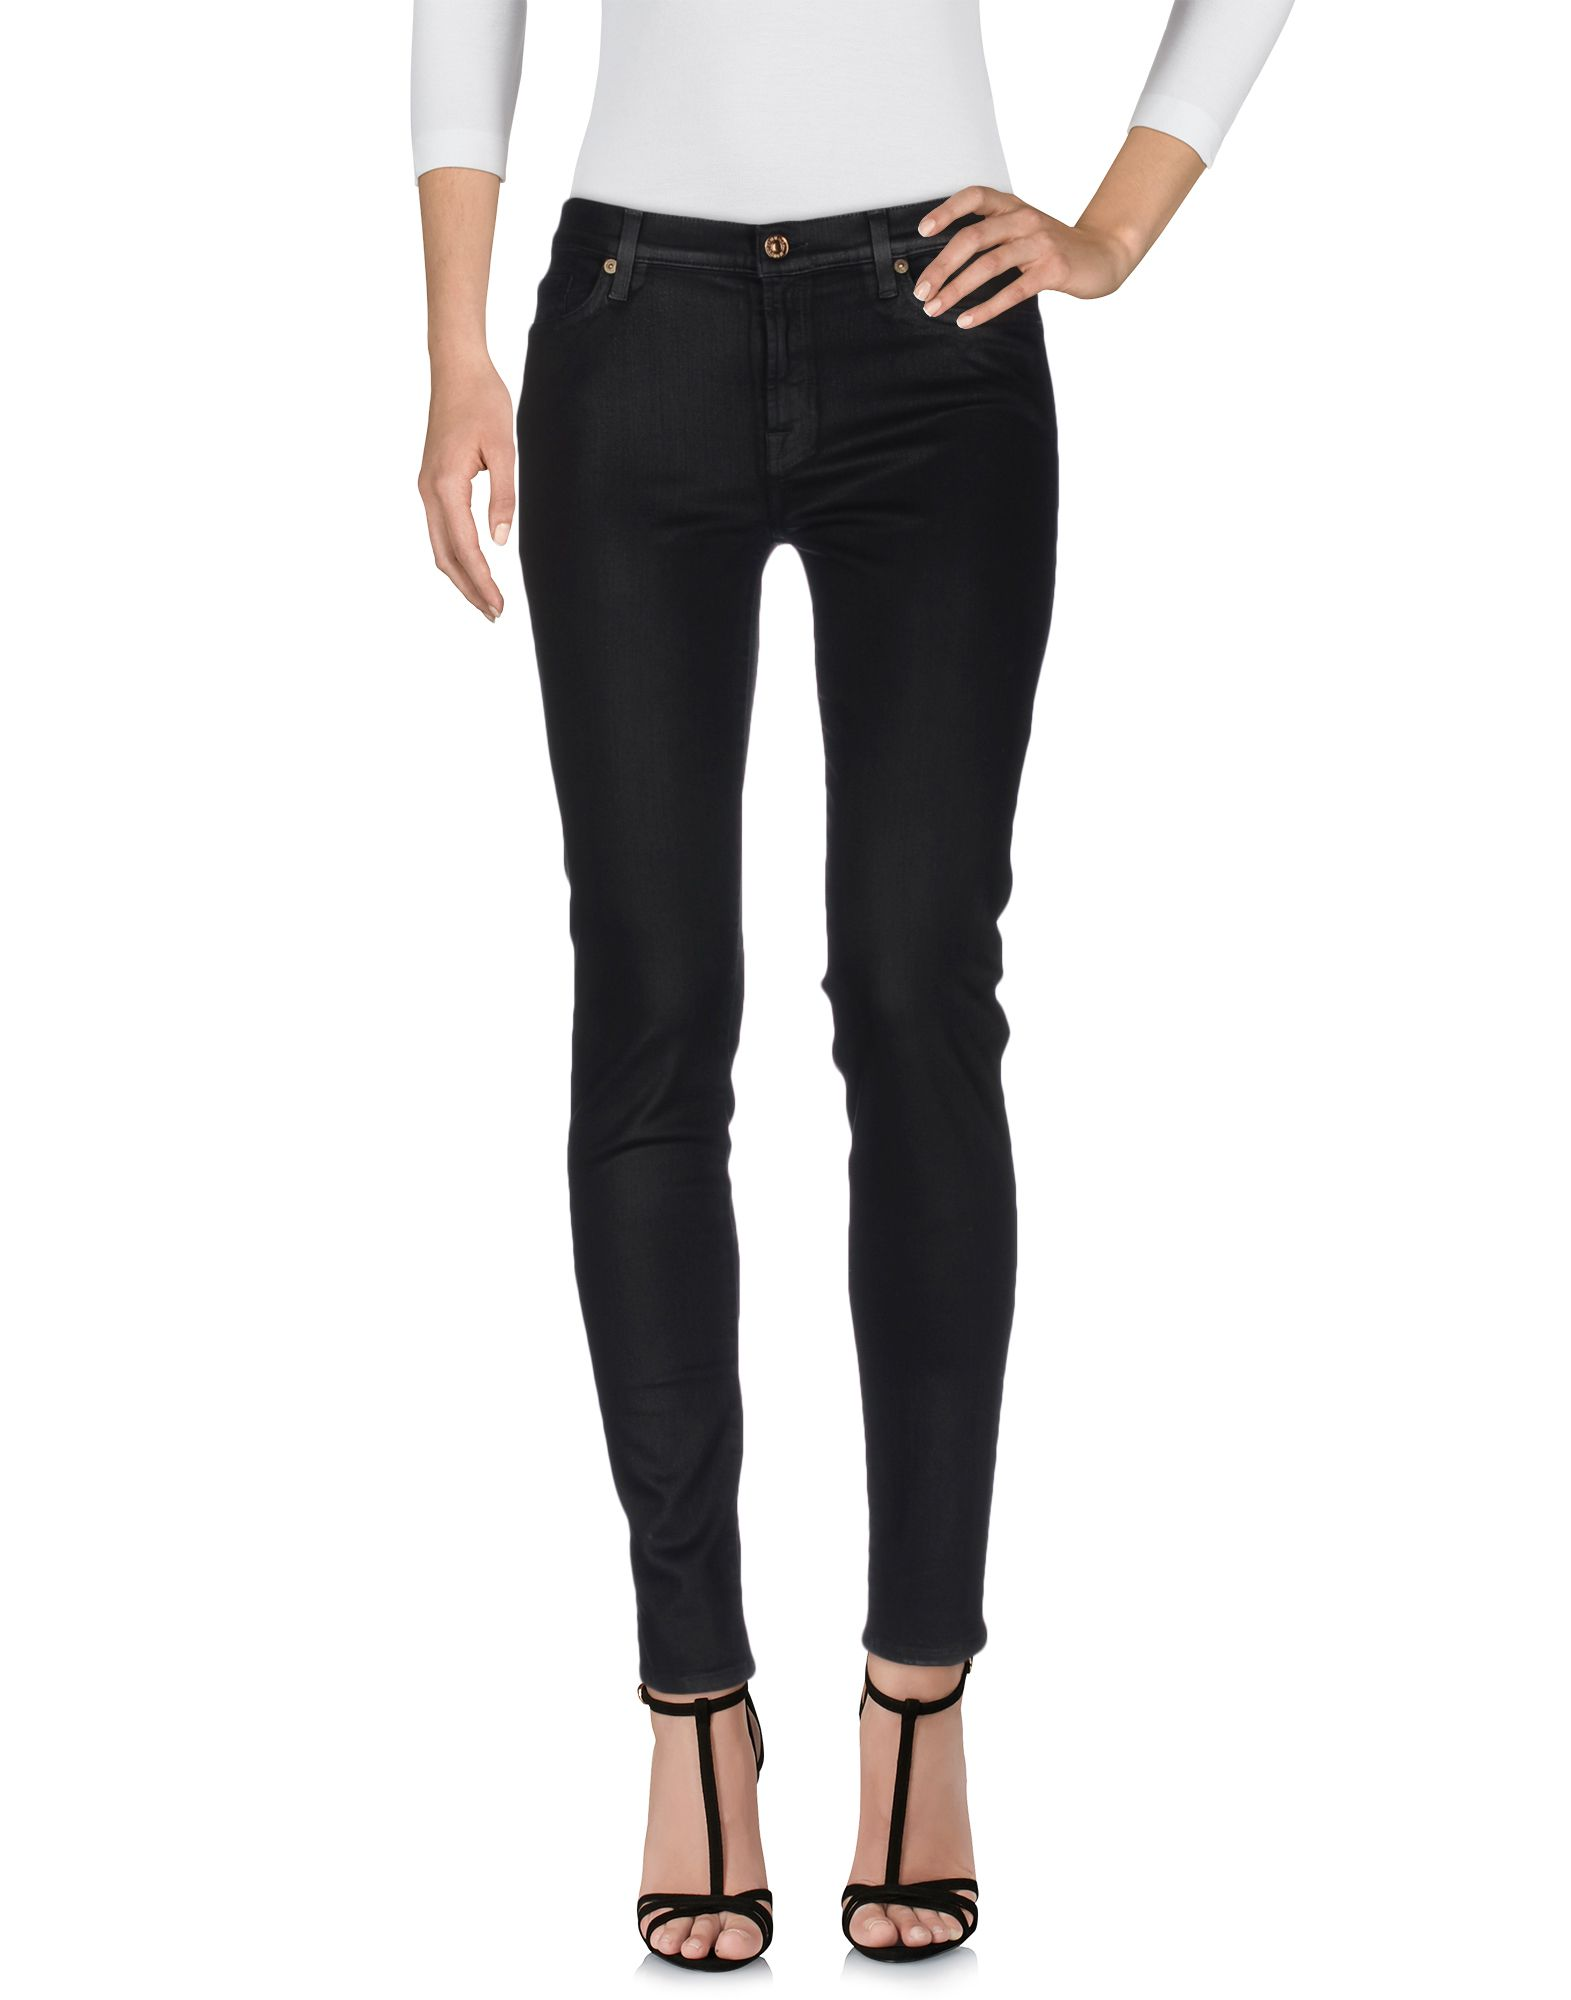 Pantaloni Jeans 7 For All Mankind Donna - Acquista online su meo2SAV3t